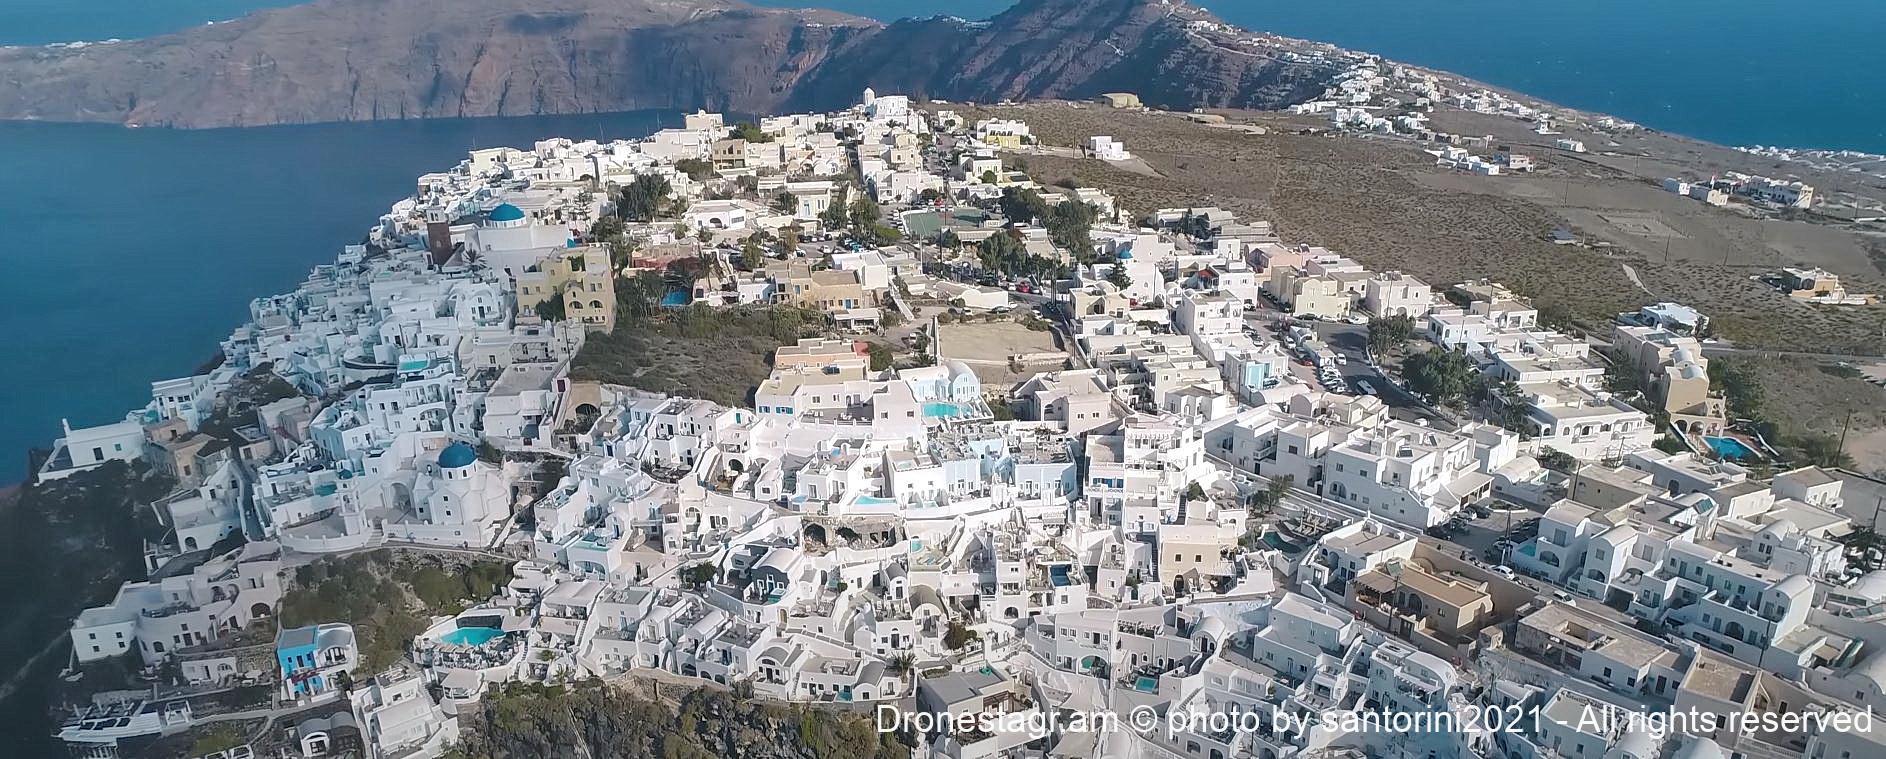 Santorini Greece Hotels at the Caldera